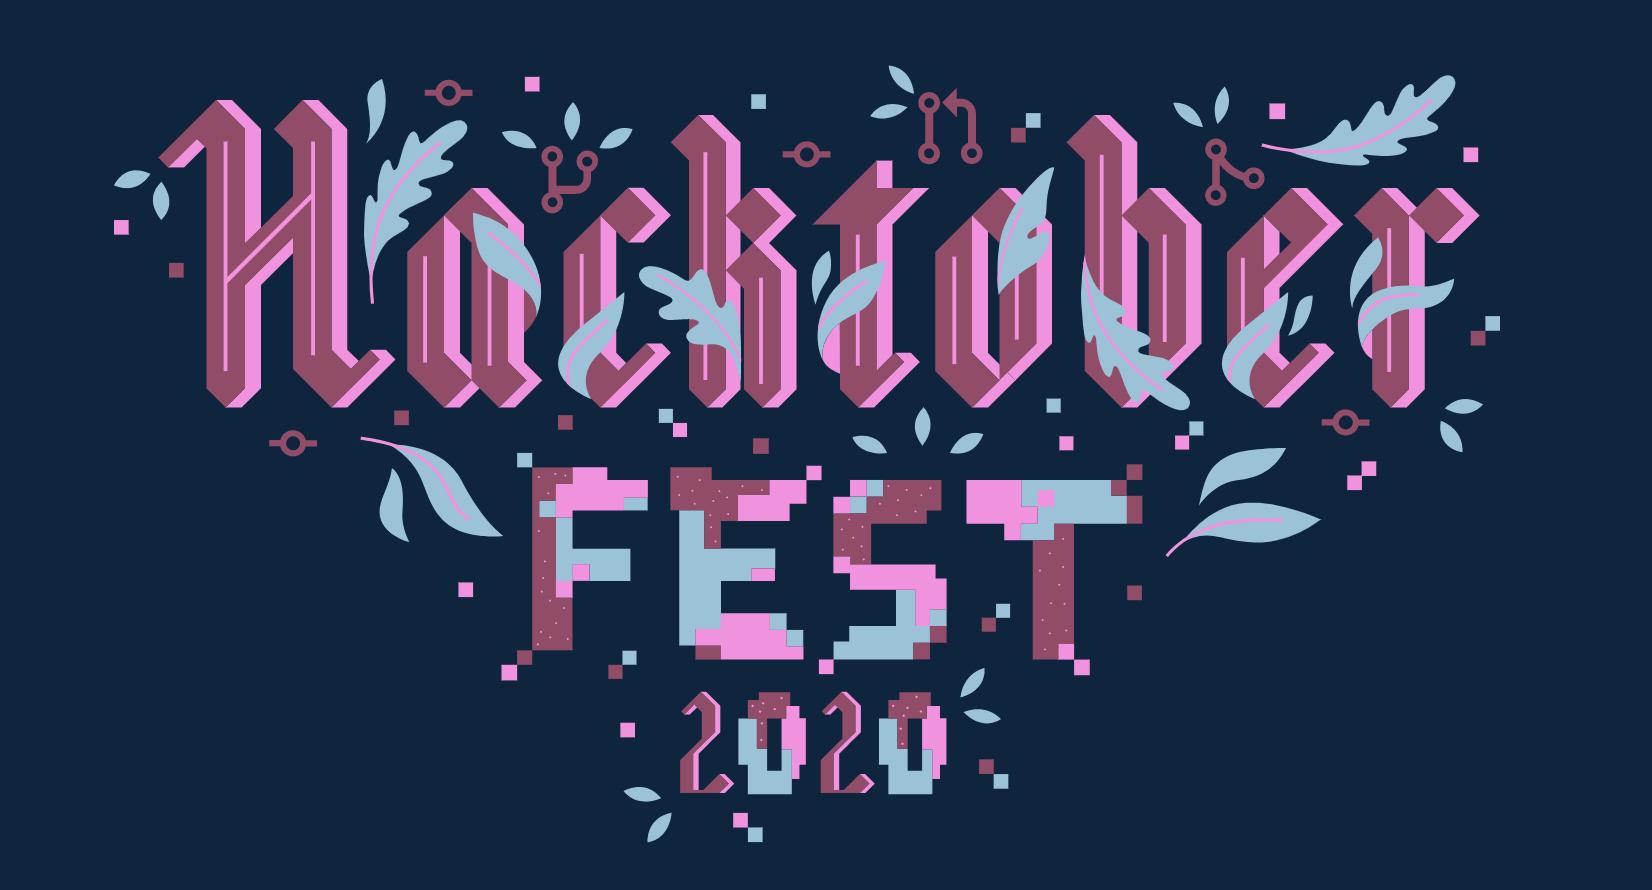 Welcome to Hacktoberfest - 欢迎来到Hacktoberfest